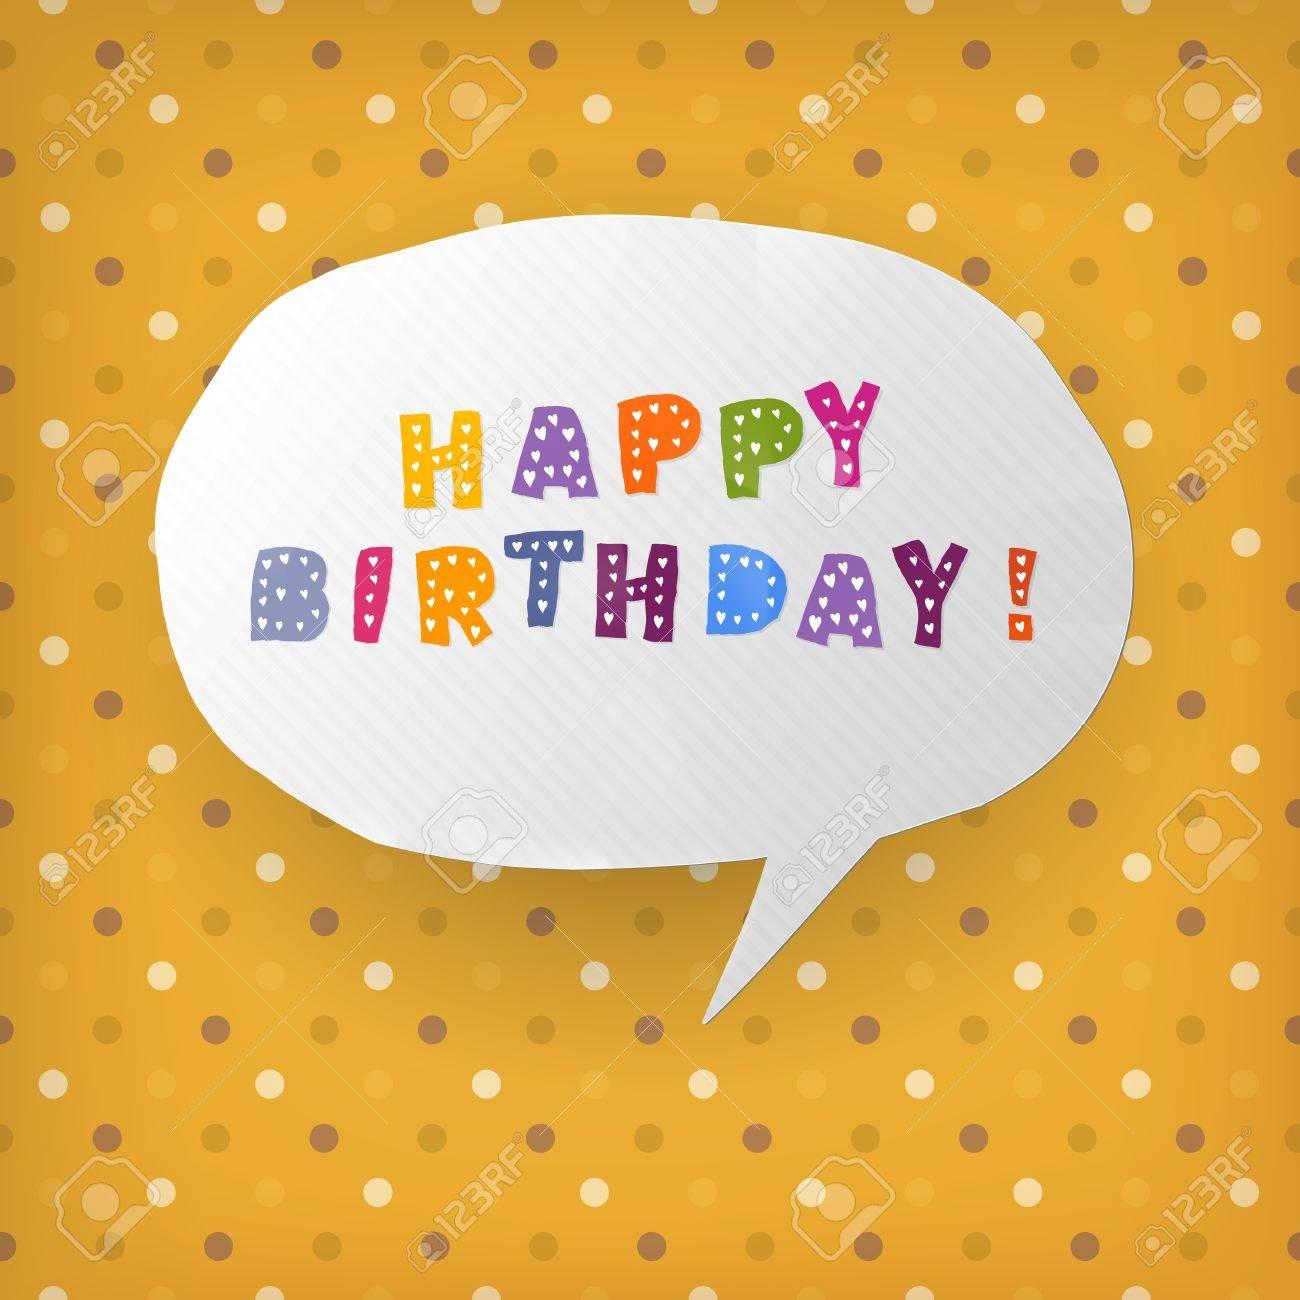 Happy birthday gift card template    illustration Stock Vector - 14894791